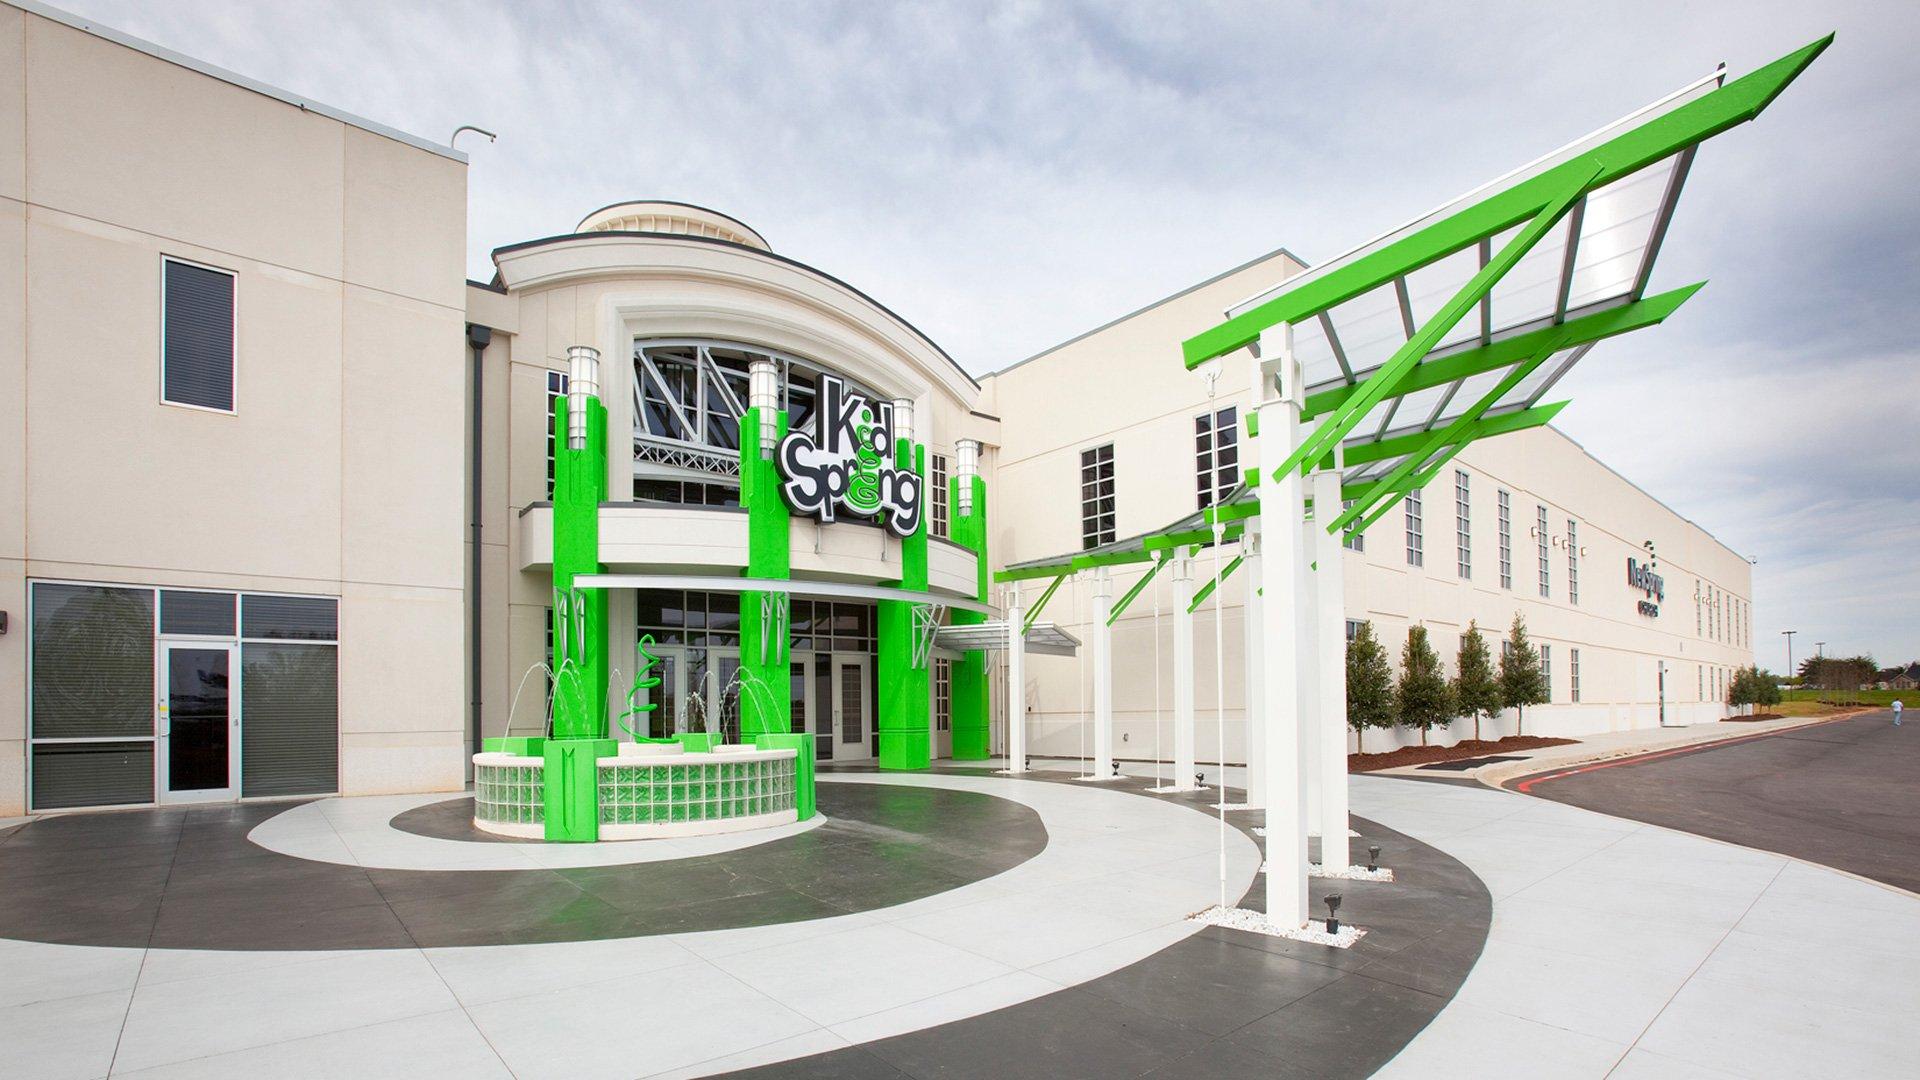 NewSpring Community Church, Children's Education Building